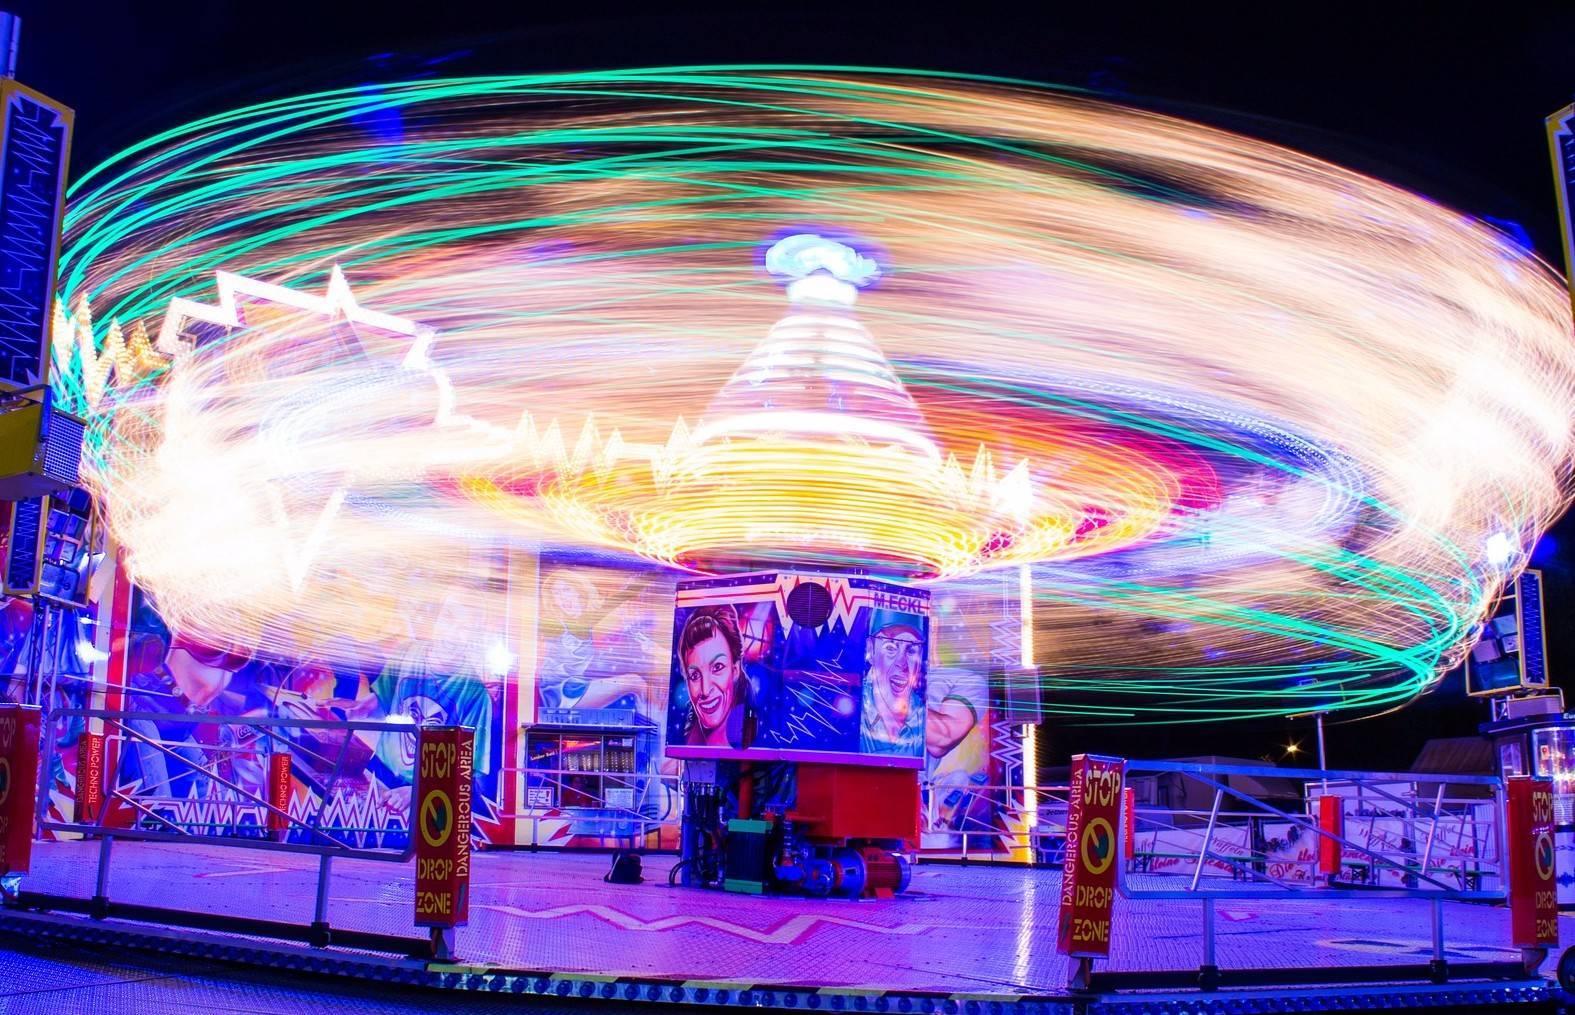 c5f1ba4081e852cef4c5_spining_neon_fair_ride_-_Edited.jpg